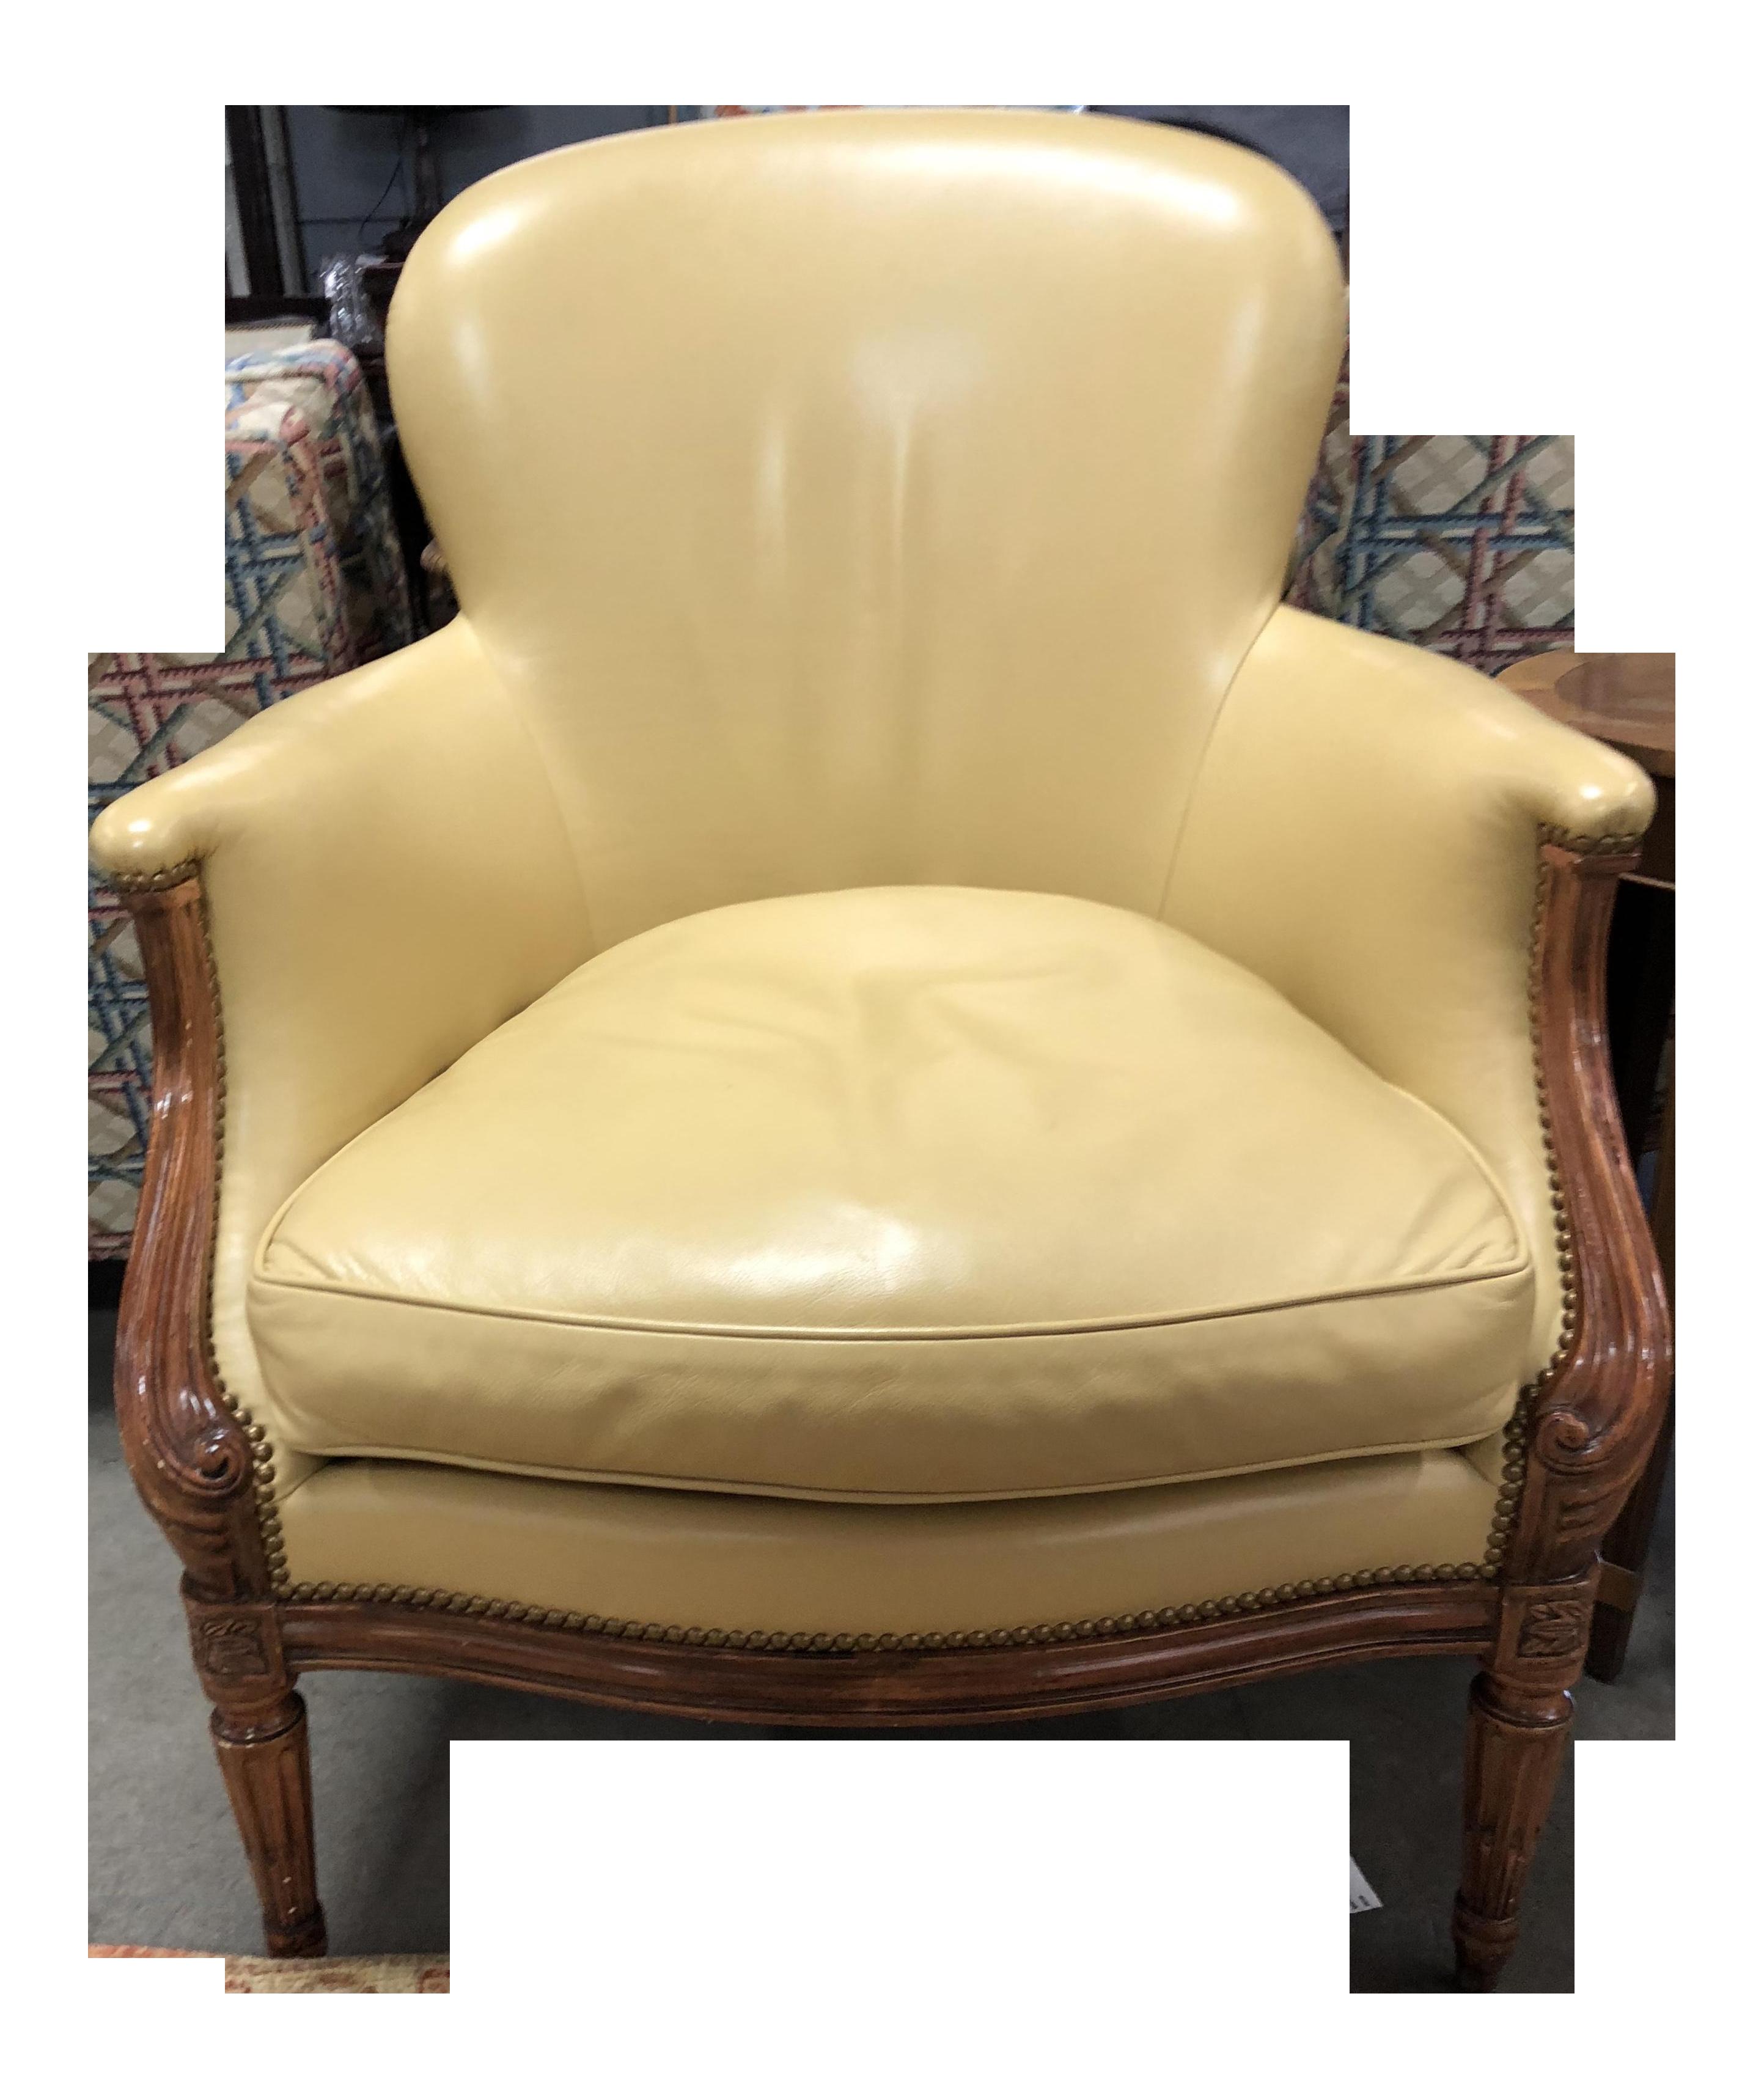 Dennis U0026 Leen Louis XVI Leather Library Chair